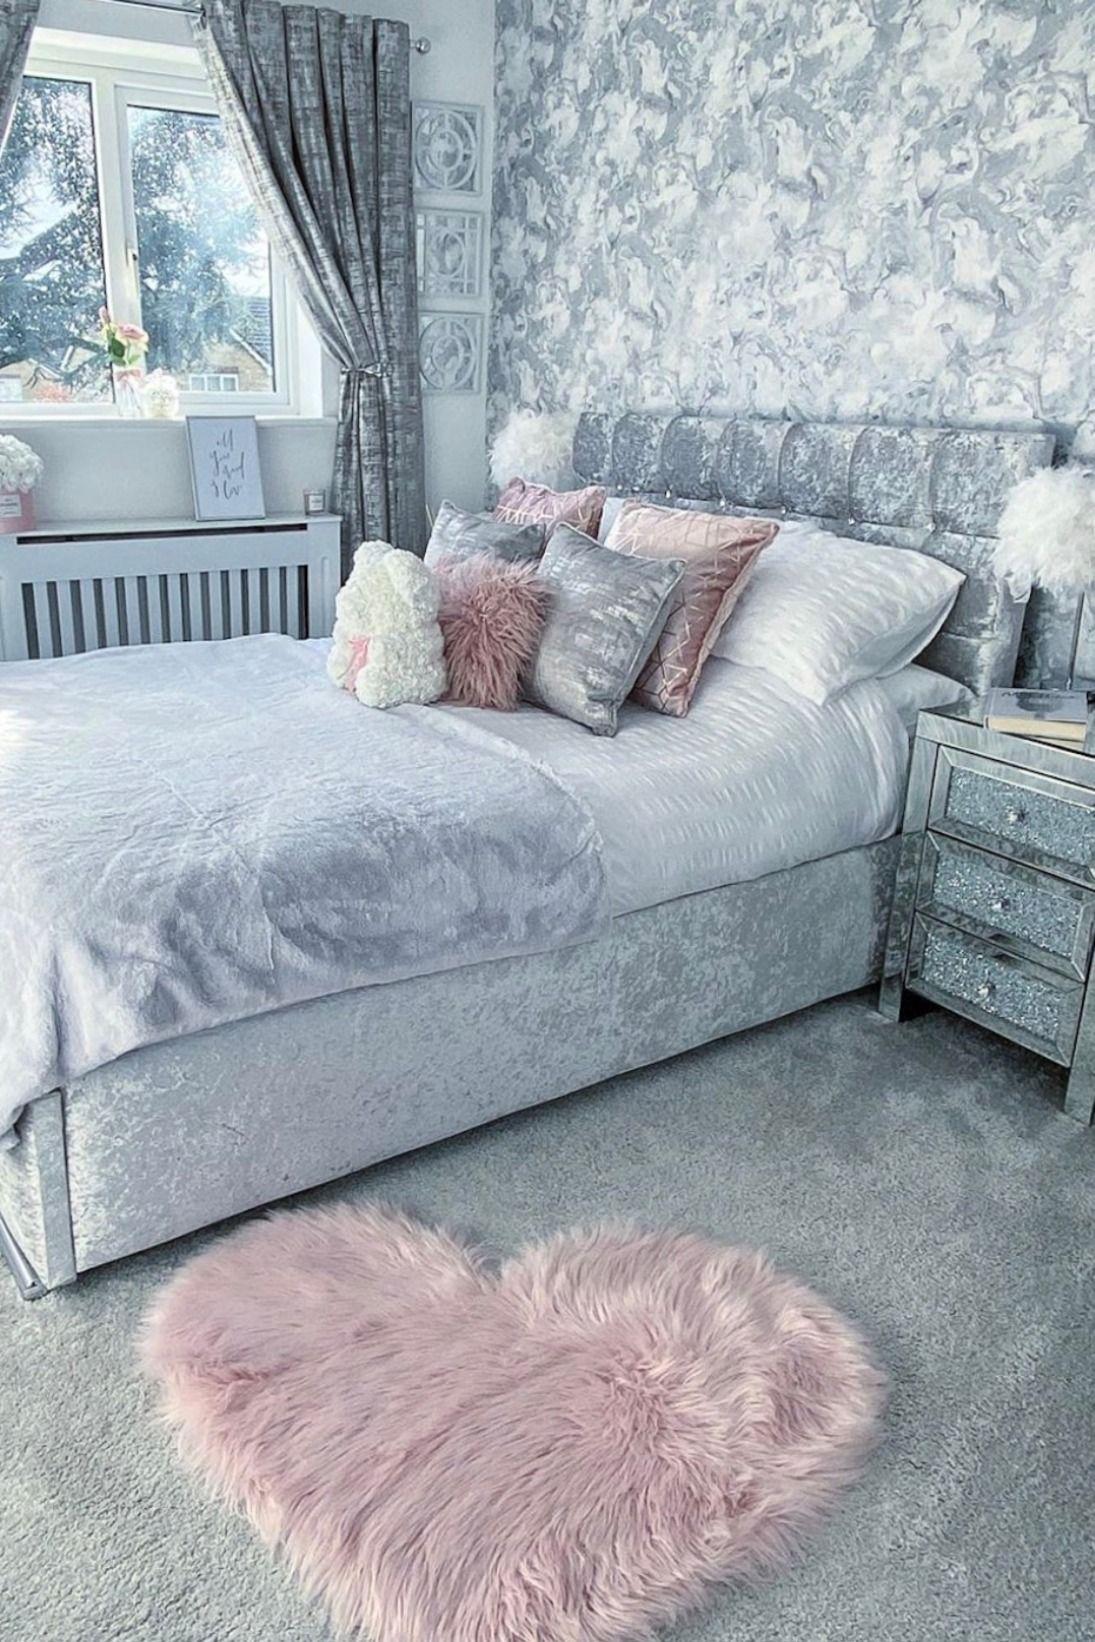 Best Liquid Marble Wallpaper Silver Girl Bedroom Decor Dream 640 x 480